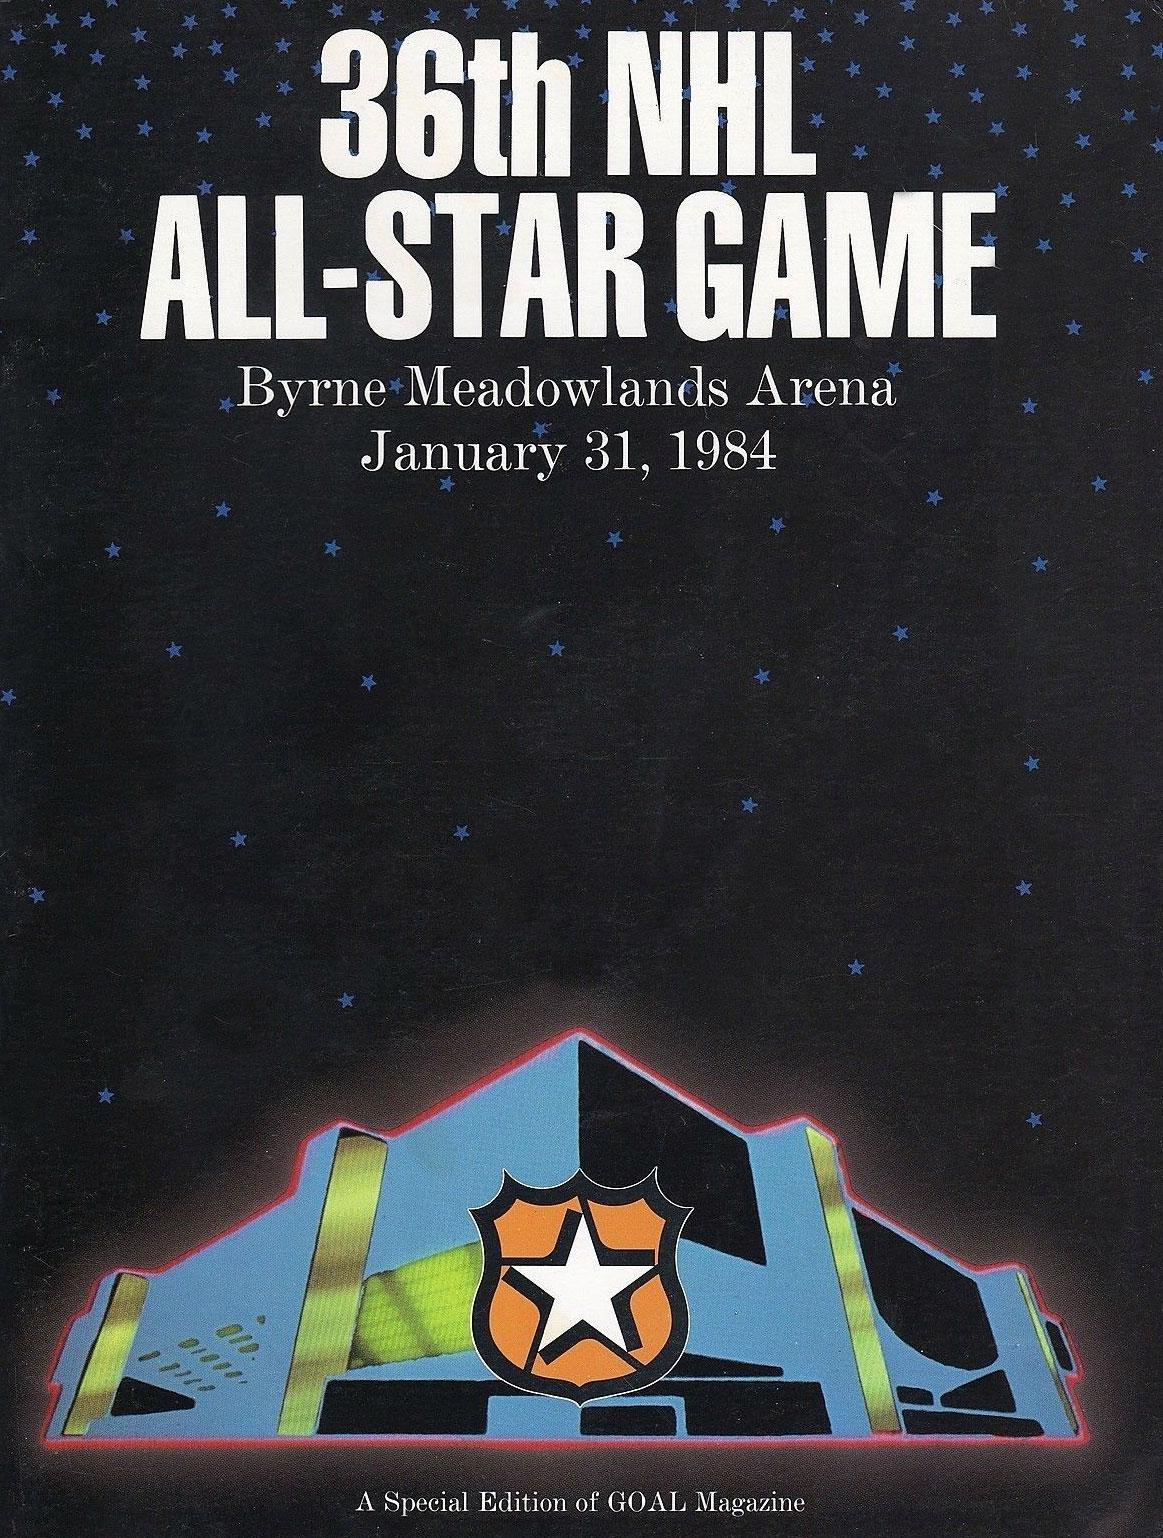 NHL All-Star Game Program Program (1983/84) - 1984 NHL All-Star Game Program - East Rutherford, NJ hosted by New Jersey Devils SportsLogos.Net